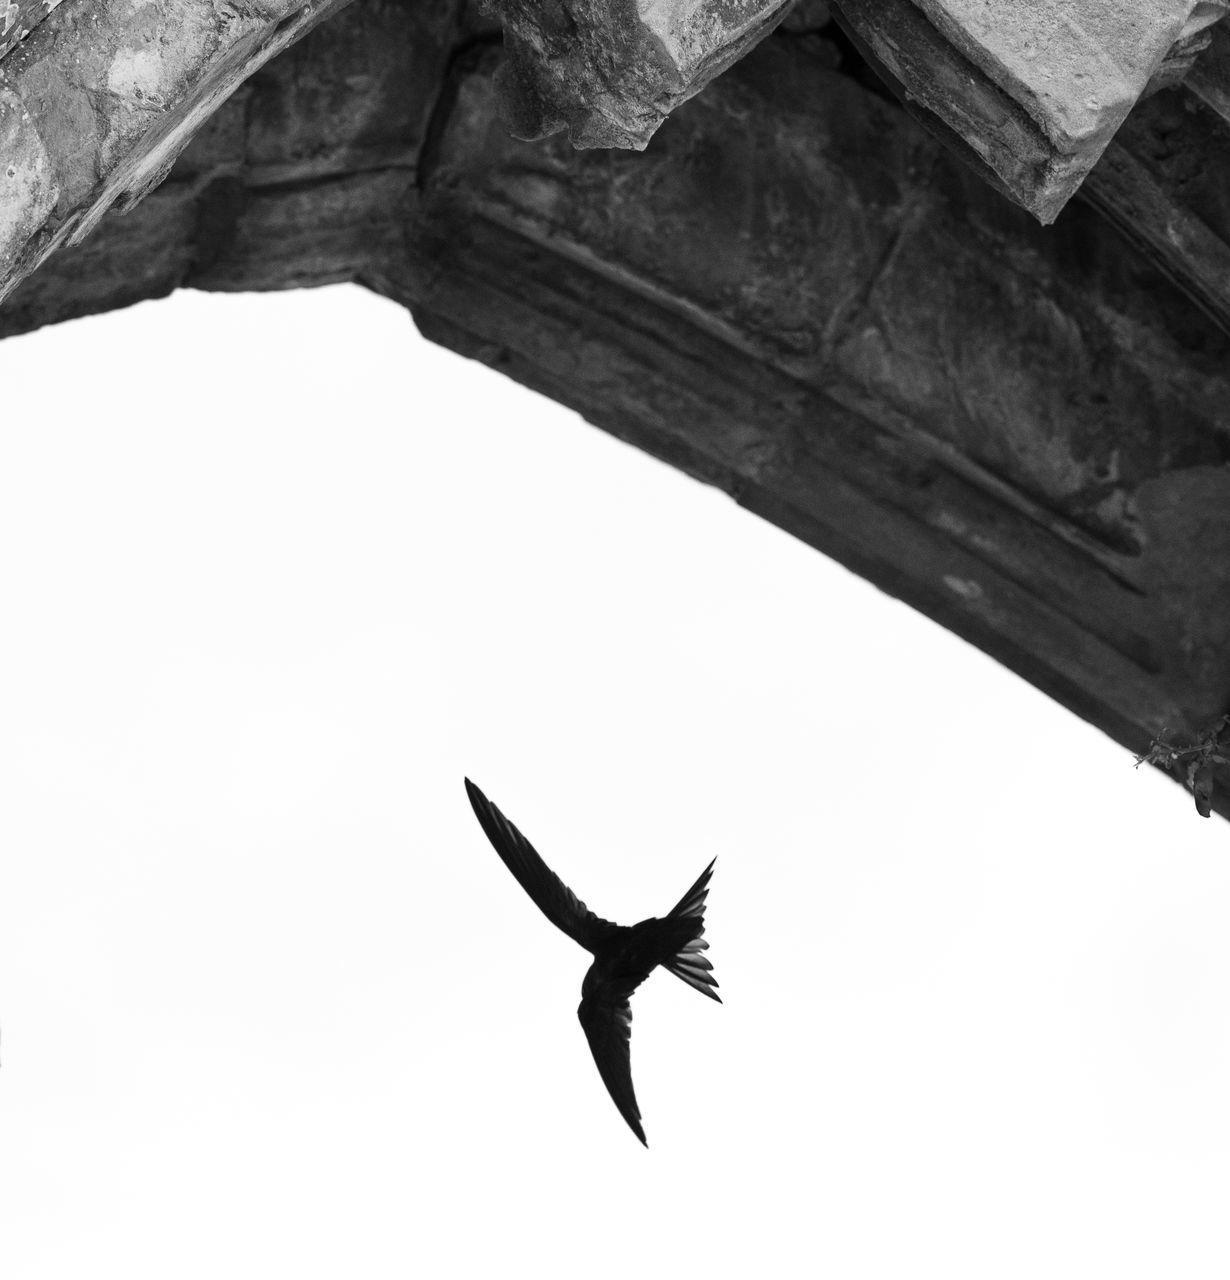 DIRECTLY BELOW SHOT OF BIRD FLYING